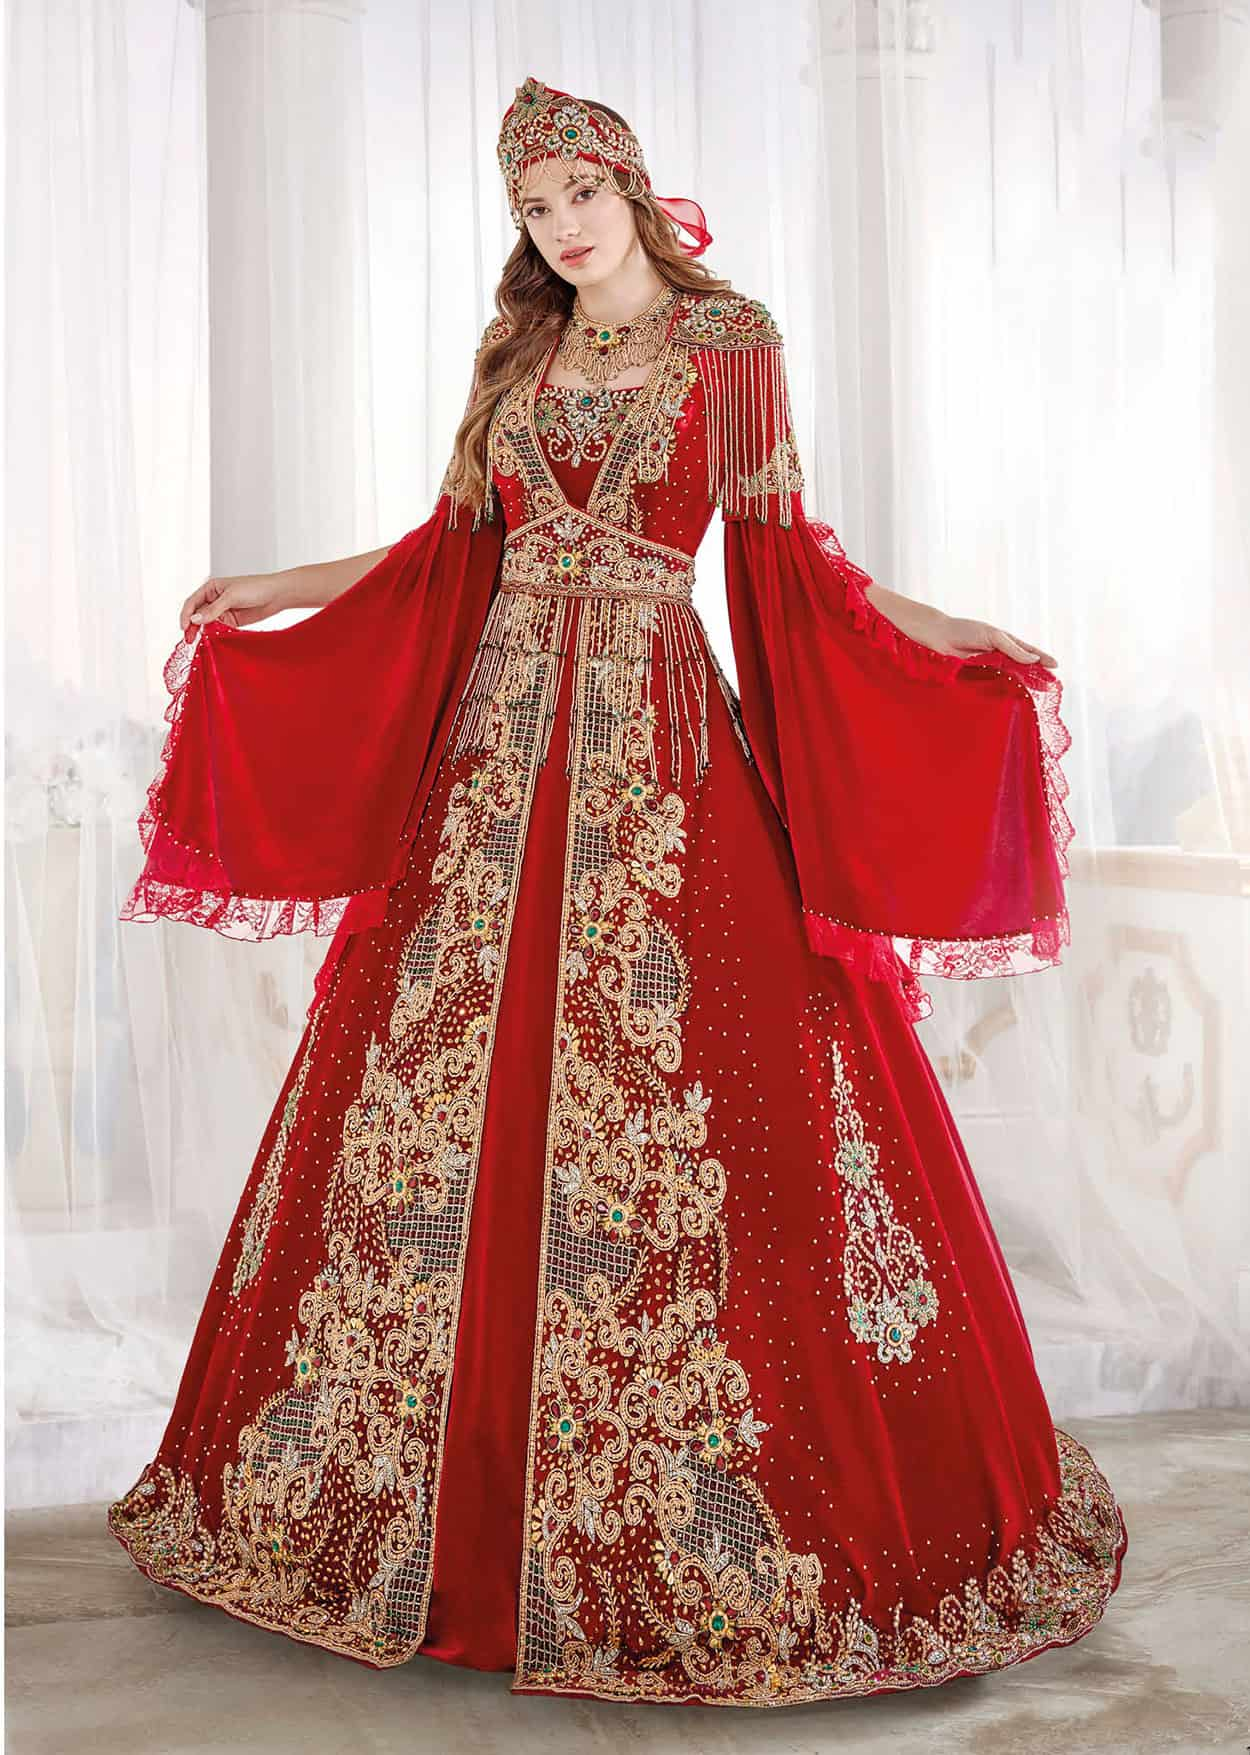 90fa0fb912 best turkish dresses. Luxury exclusive Chic Caftan Set Velvet Delicate  Sequins buy online evening ...